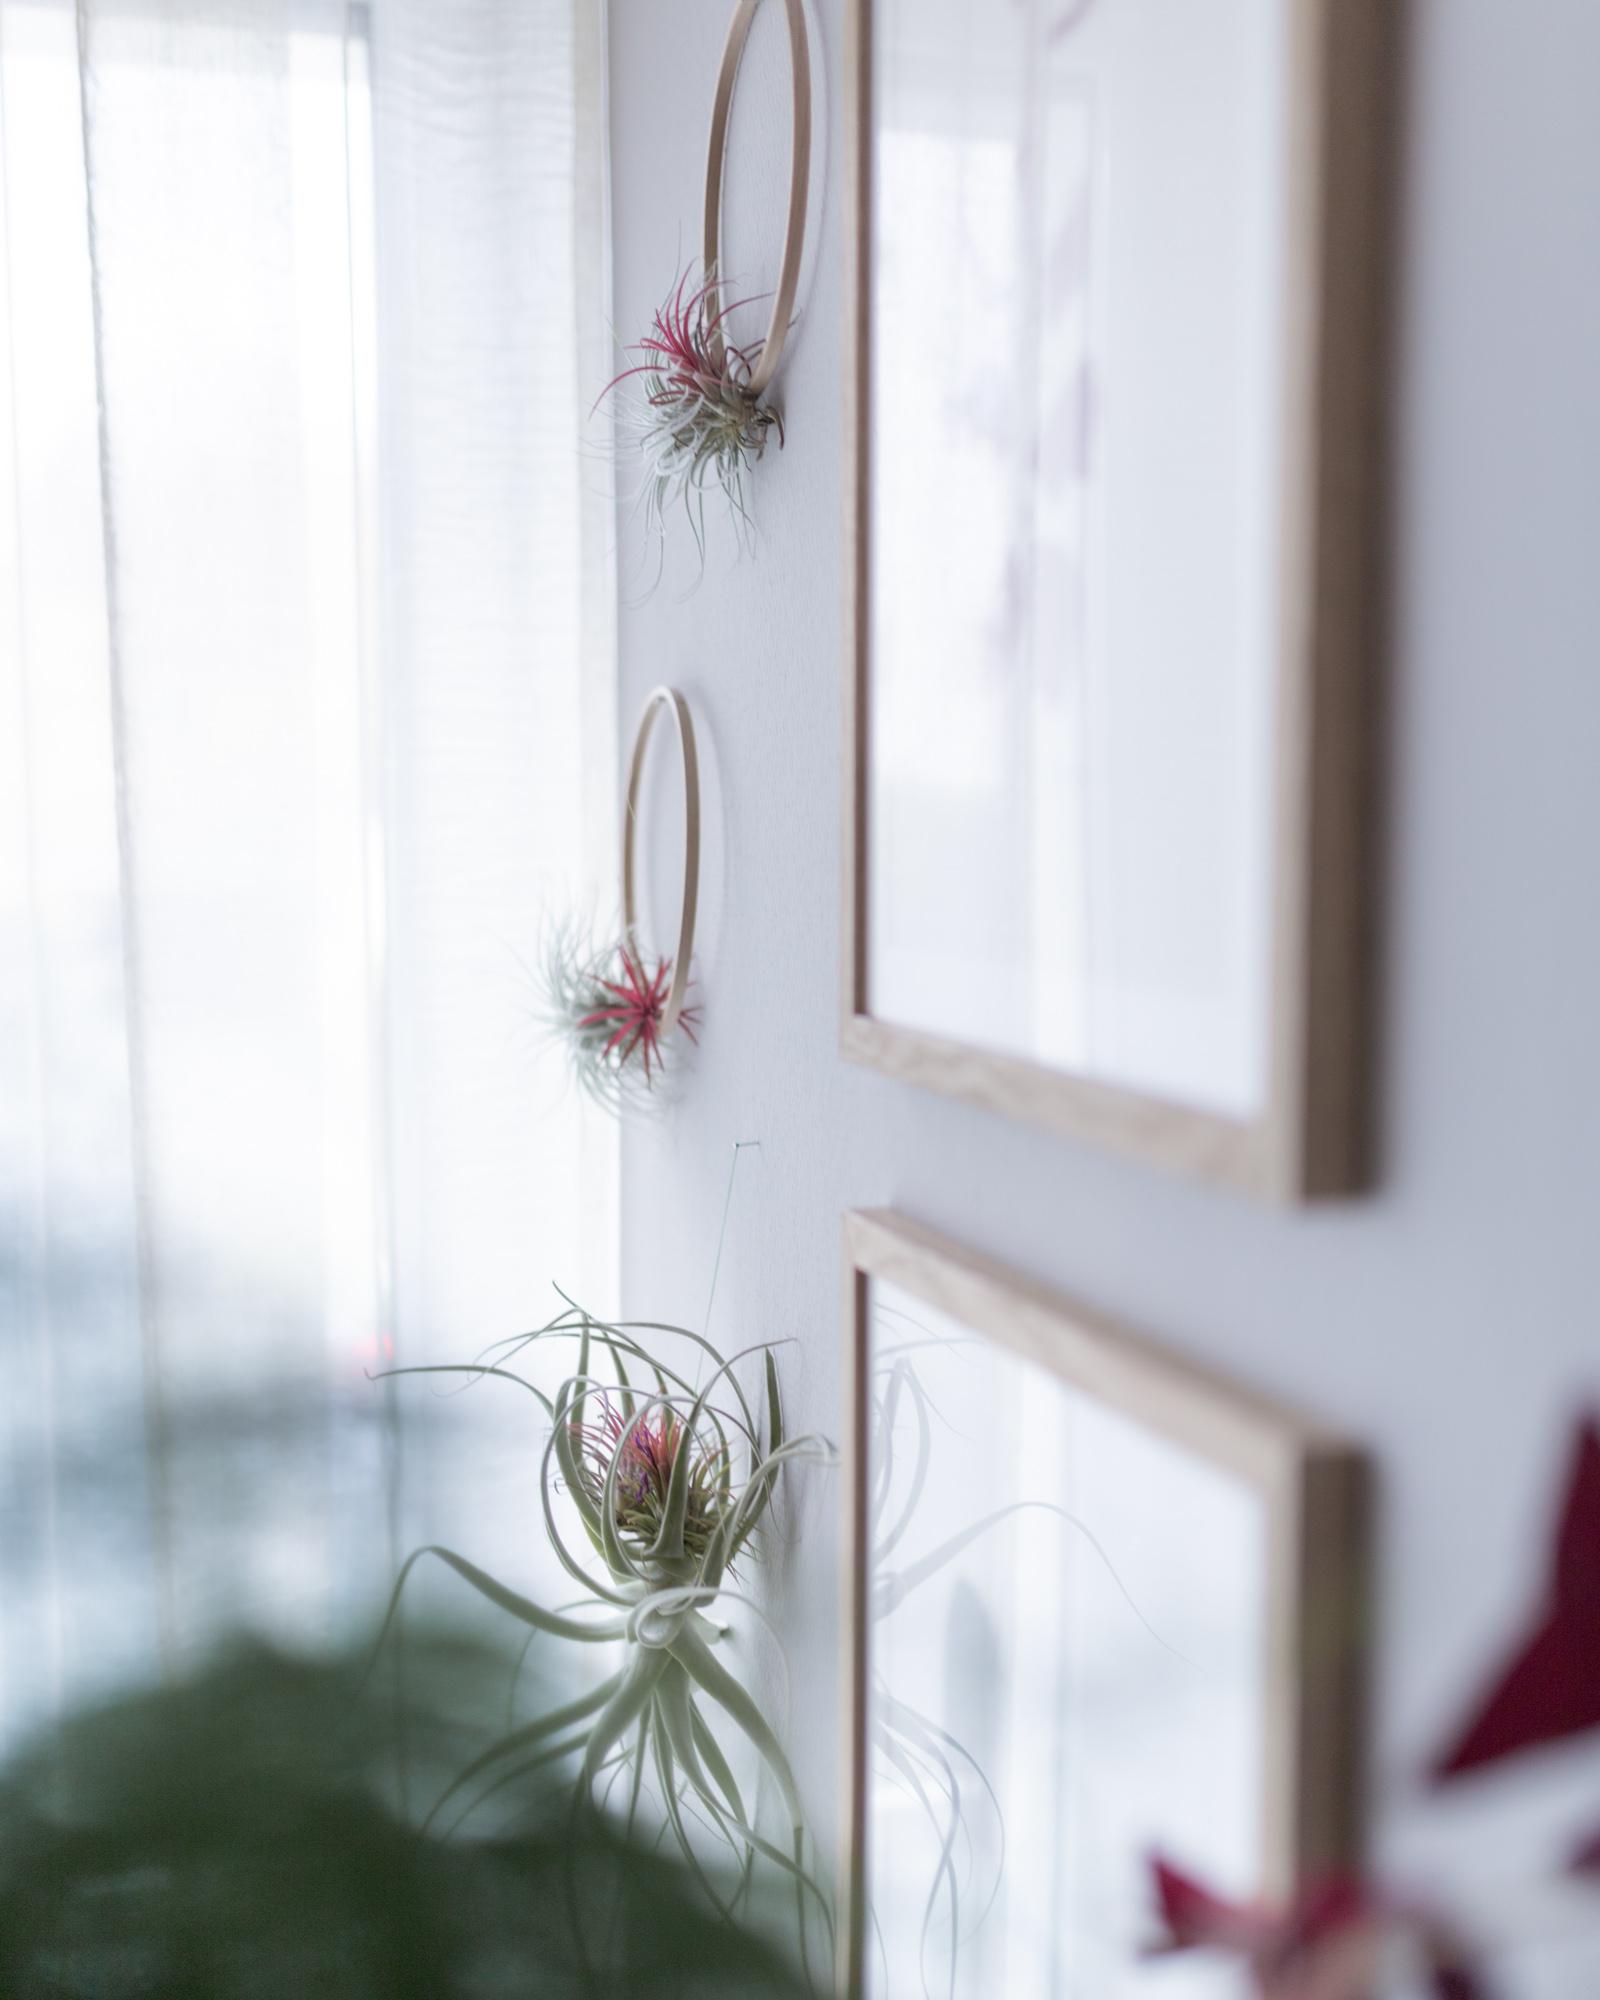 Tillandsien Wandschmuck DIY mit Stickrahmen